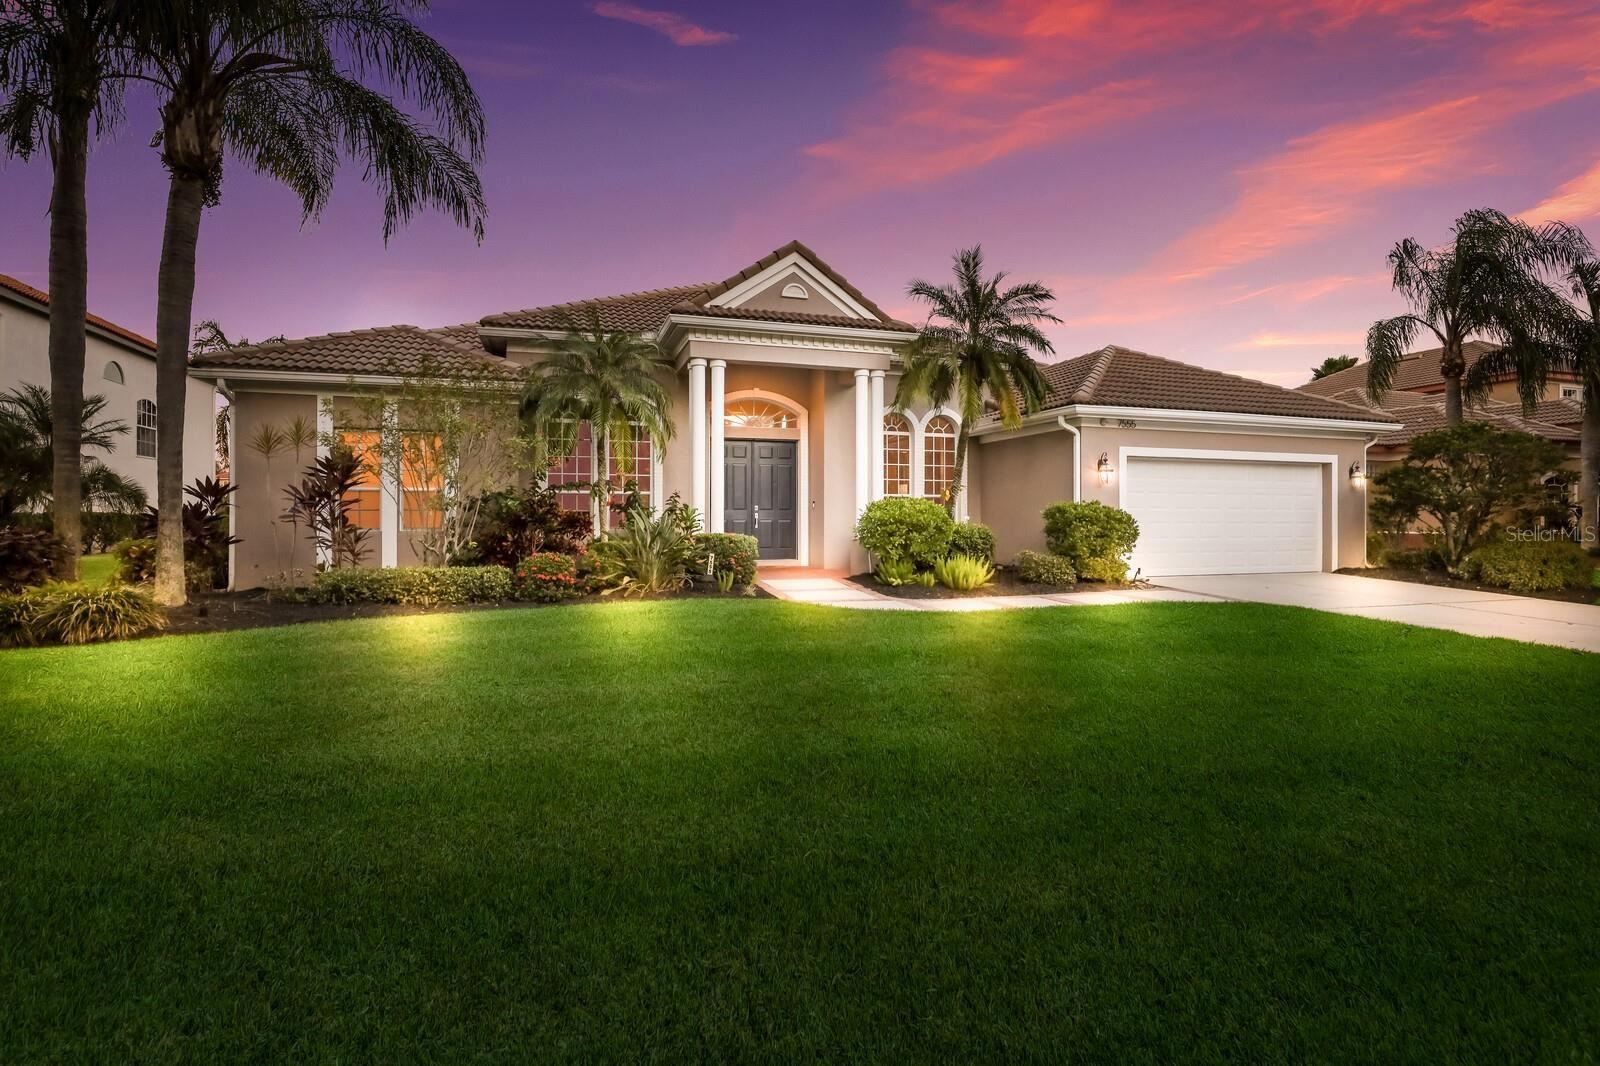 Photo of 7555 TORI WAY, LAKEWOOD RANCH, FL 34202 (MLS # A4515779)